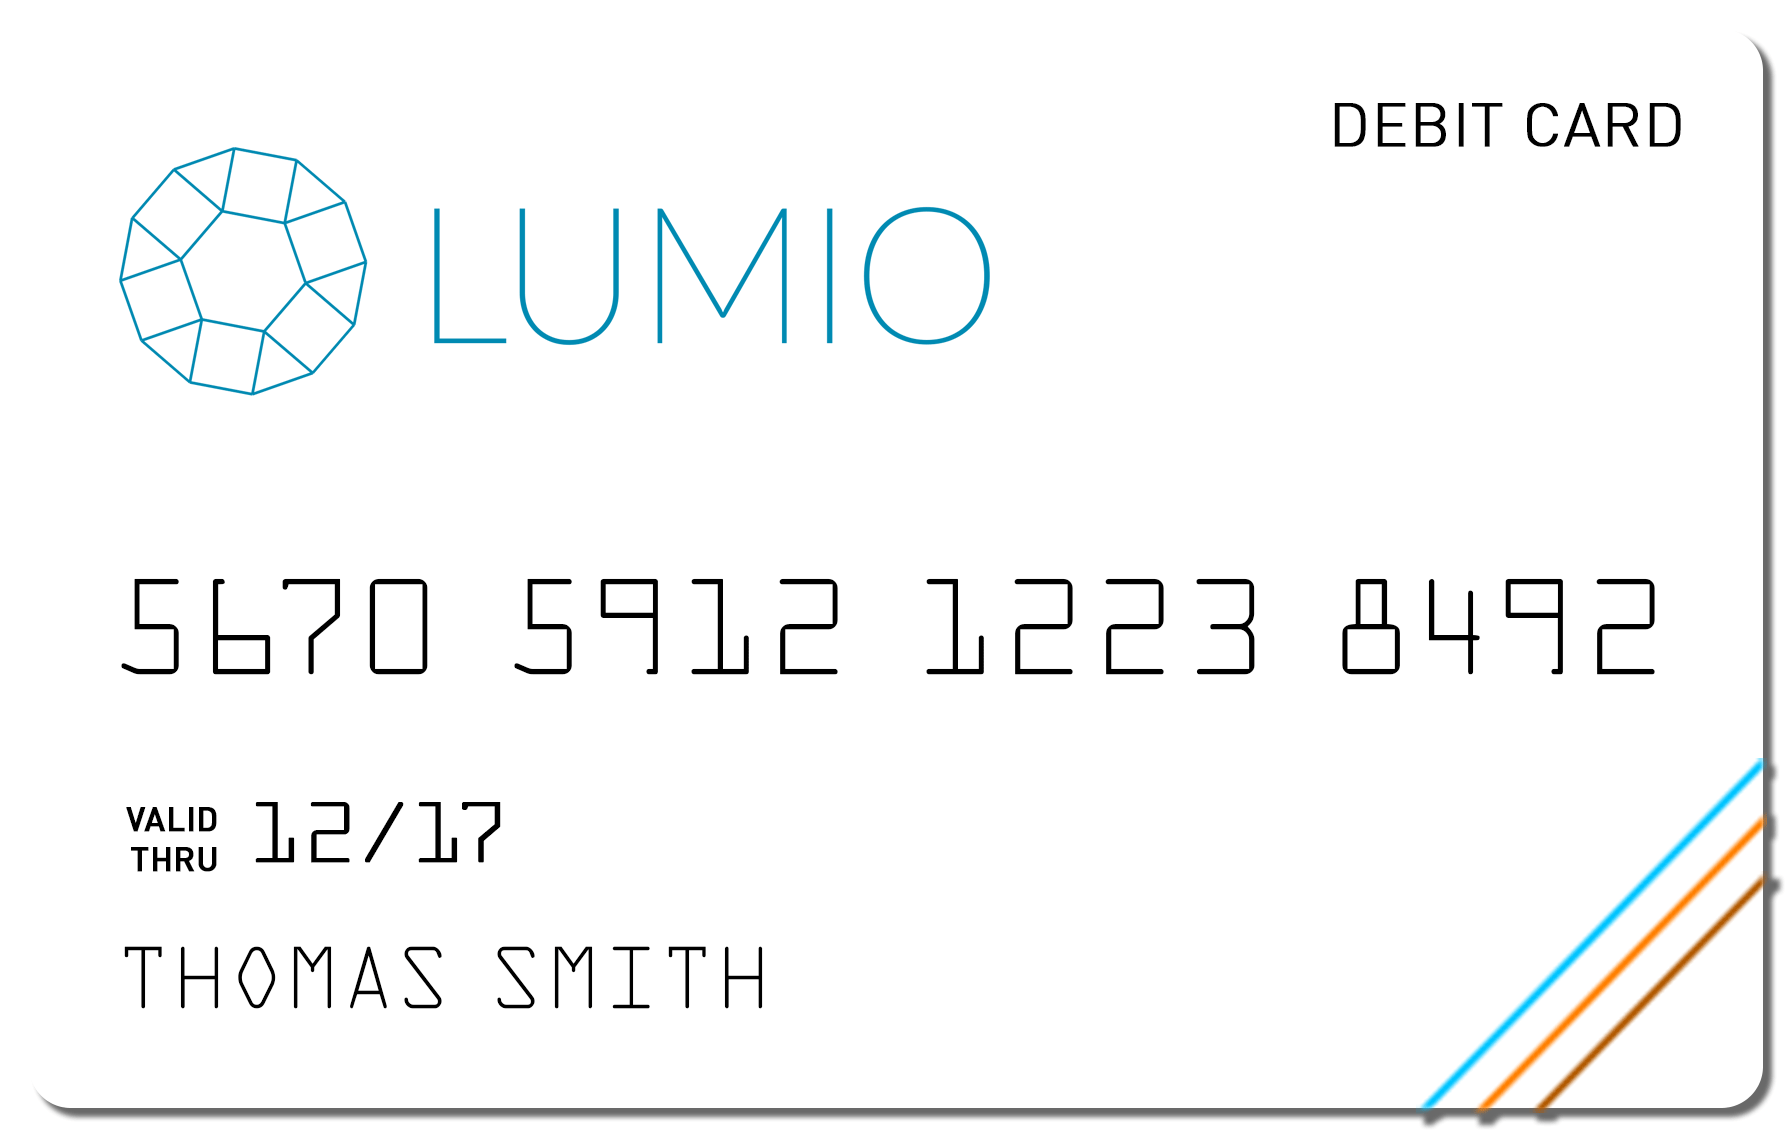 Lumio bank card design